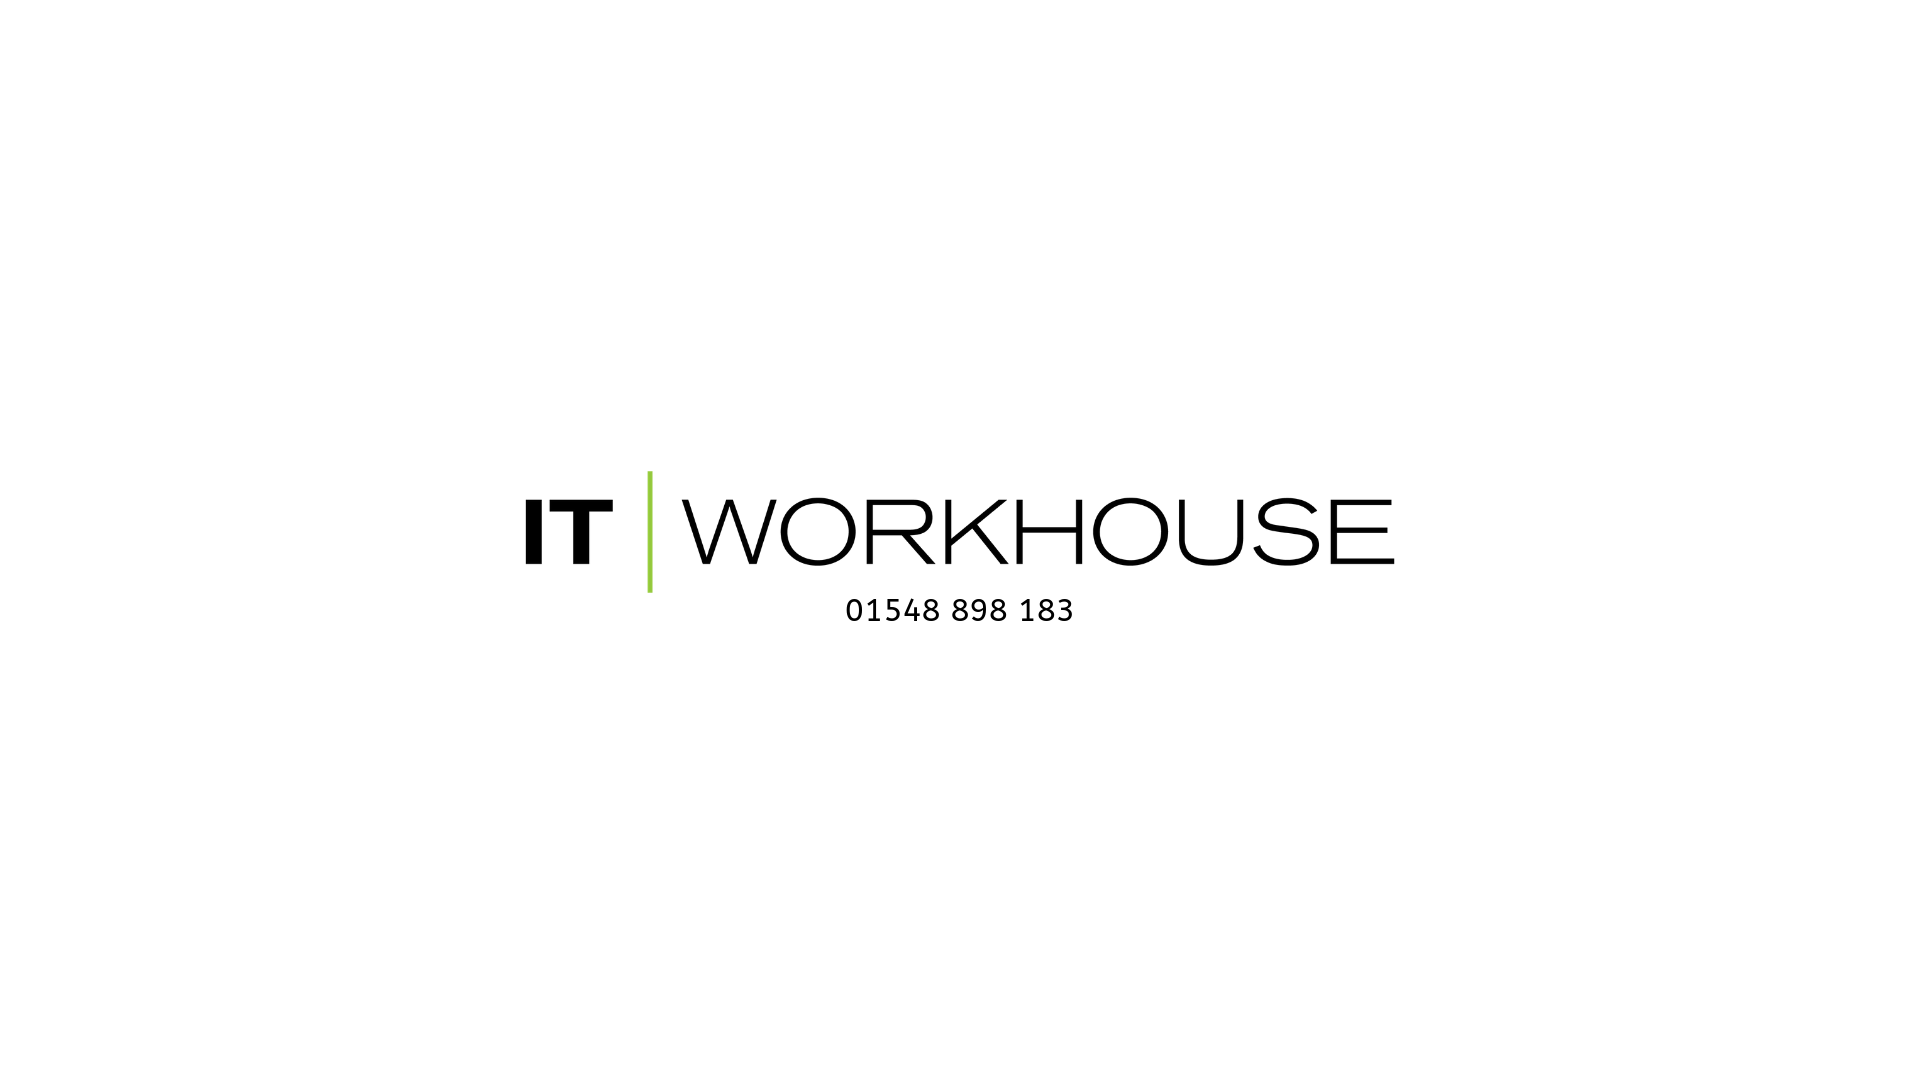 IT Workhouse Ltd